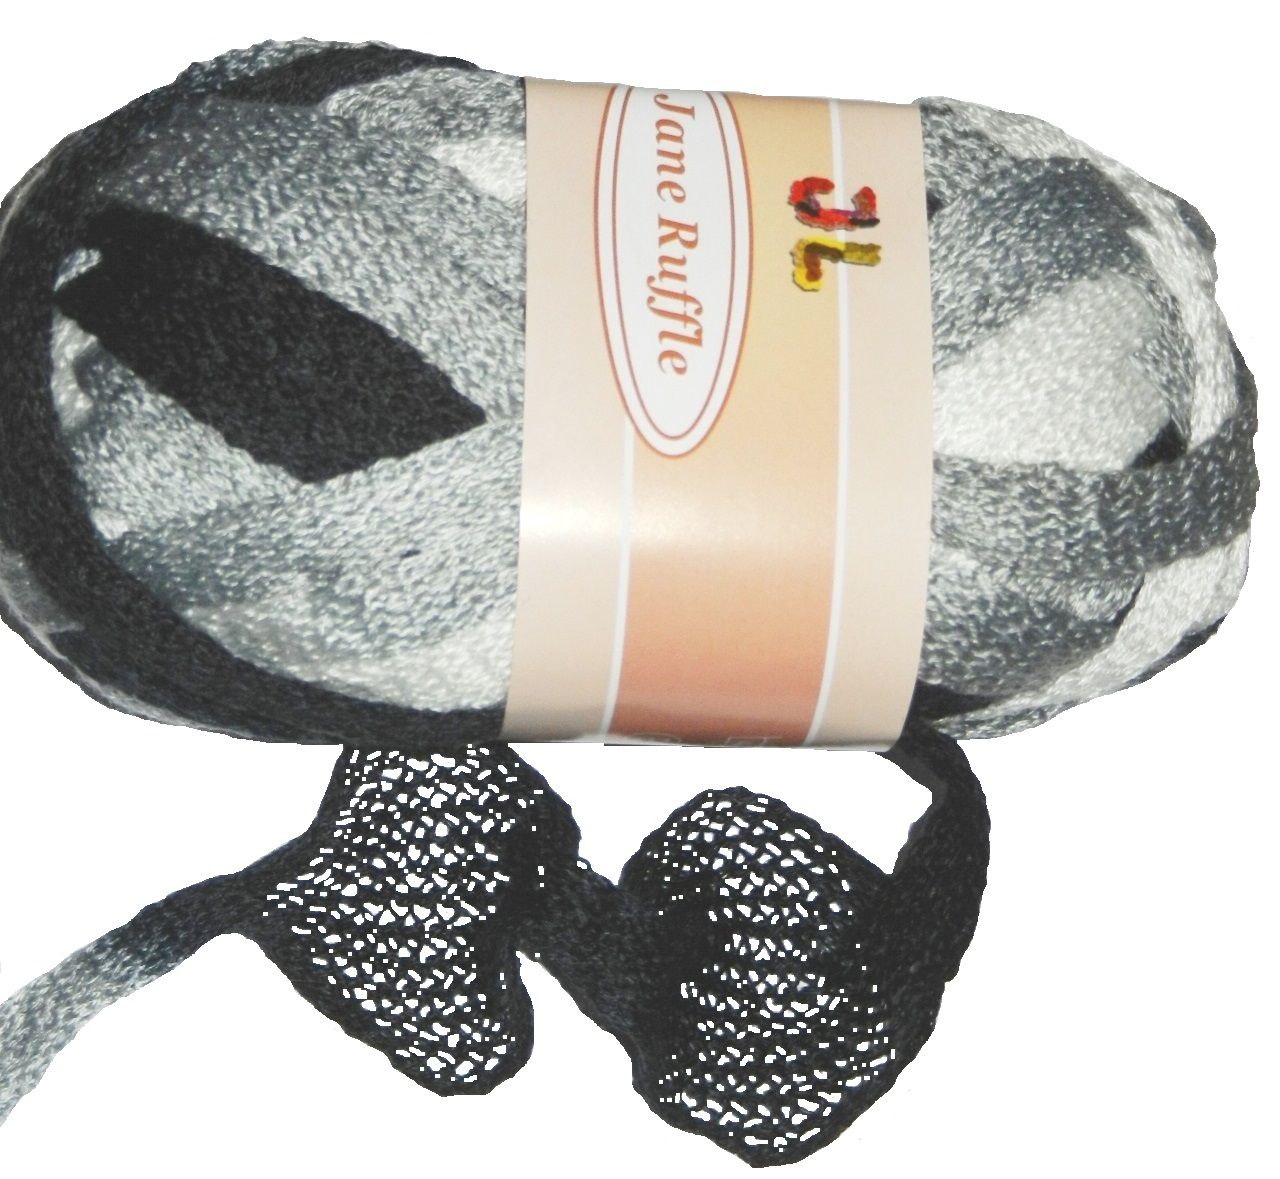 Jane Ruffle Frilly Mesh Net Style Yarn 404 Stuff To Buy